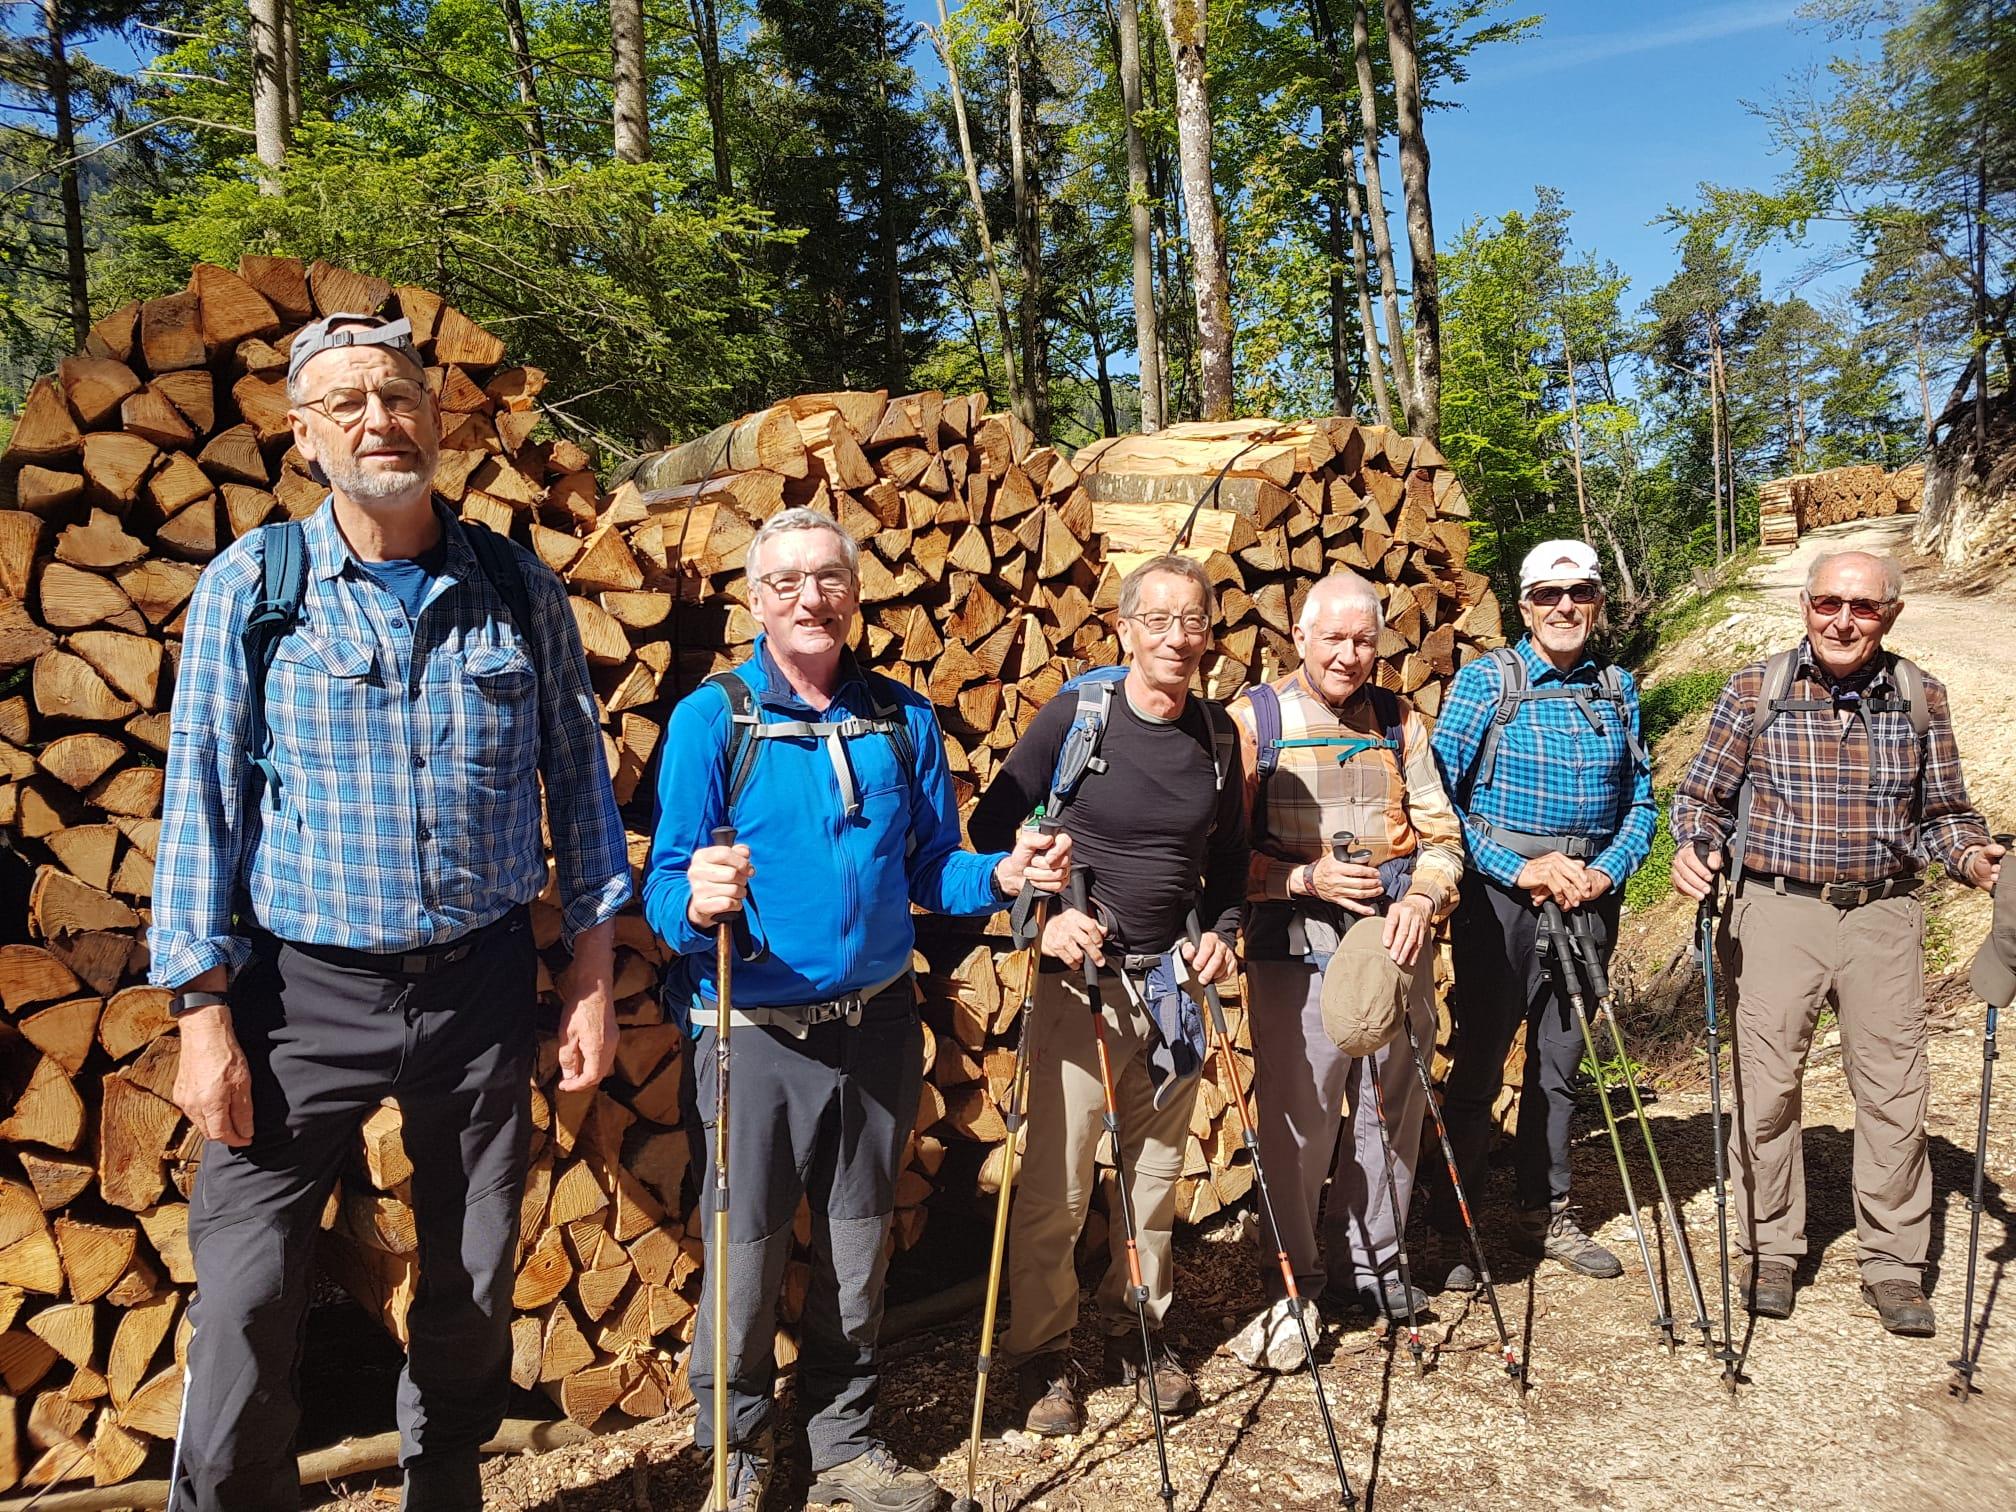 2021-05-28 Wanderung Les Faivres - alte Eibe - Franzosenloch